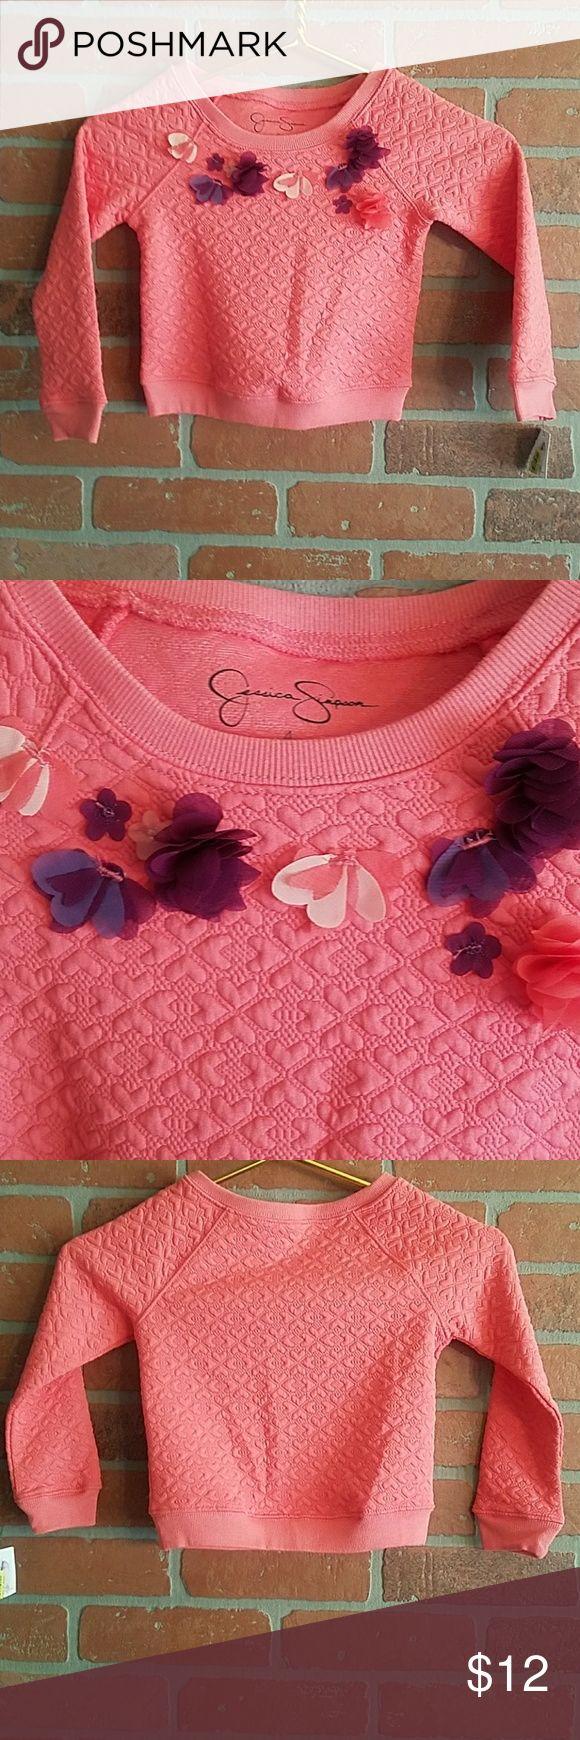 🆕Jessica Simpson Girls Quilted Sweatshirt - 4 New with tags. Jessica Simpson Shirts & Tops Sweatshirts & Hoodies